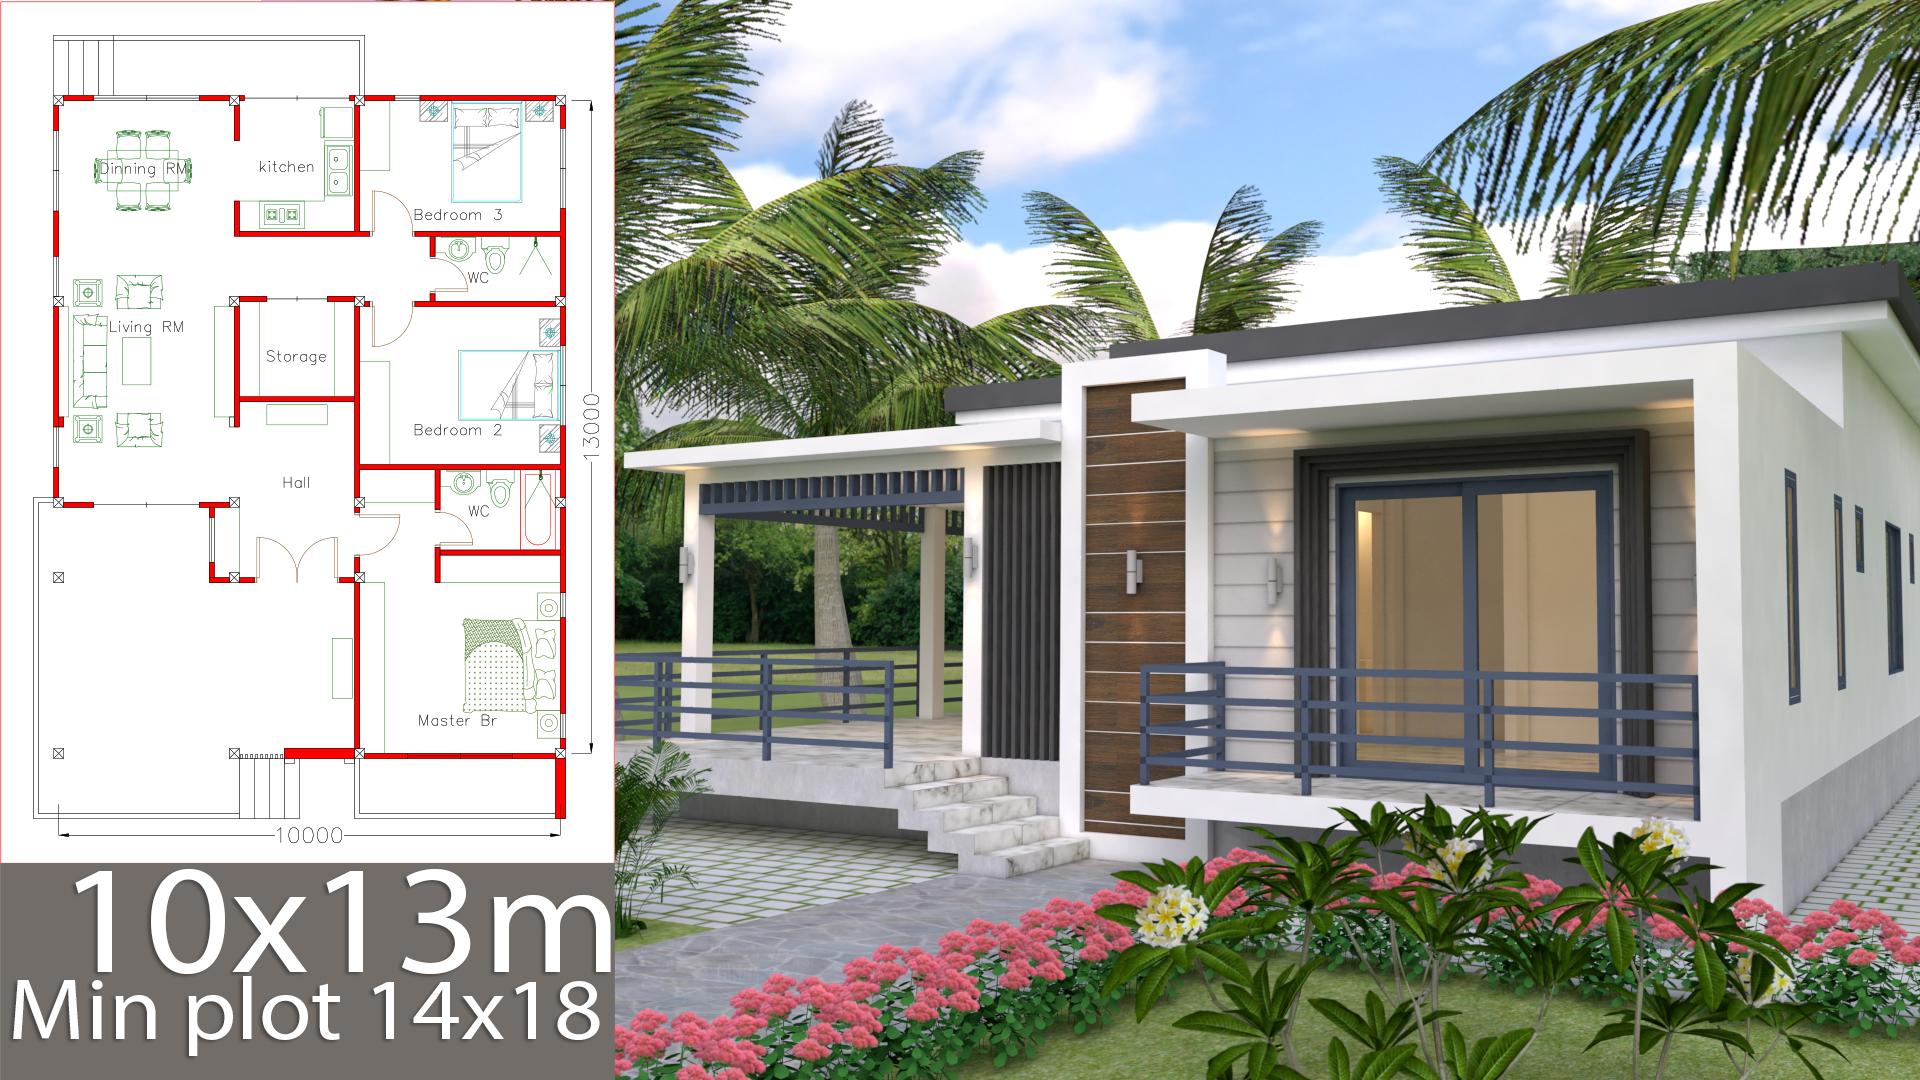 Sketchup Home Design Plan 10x13m